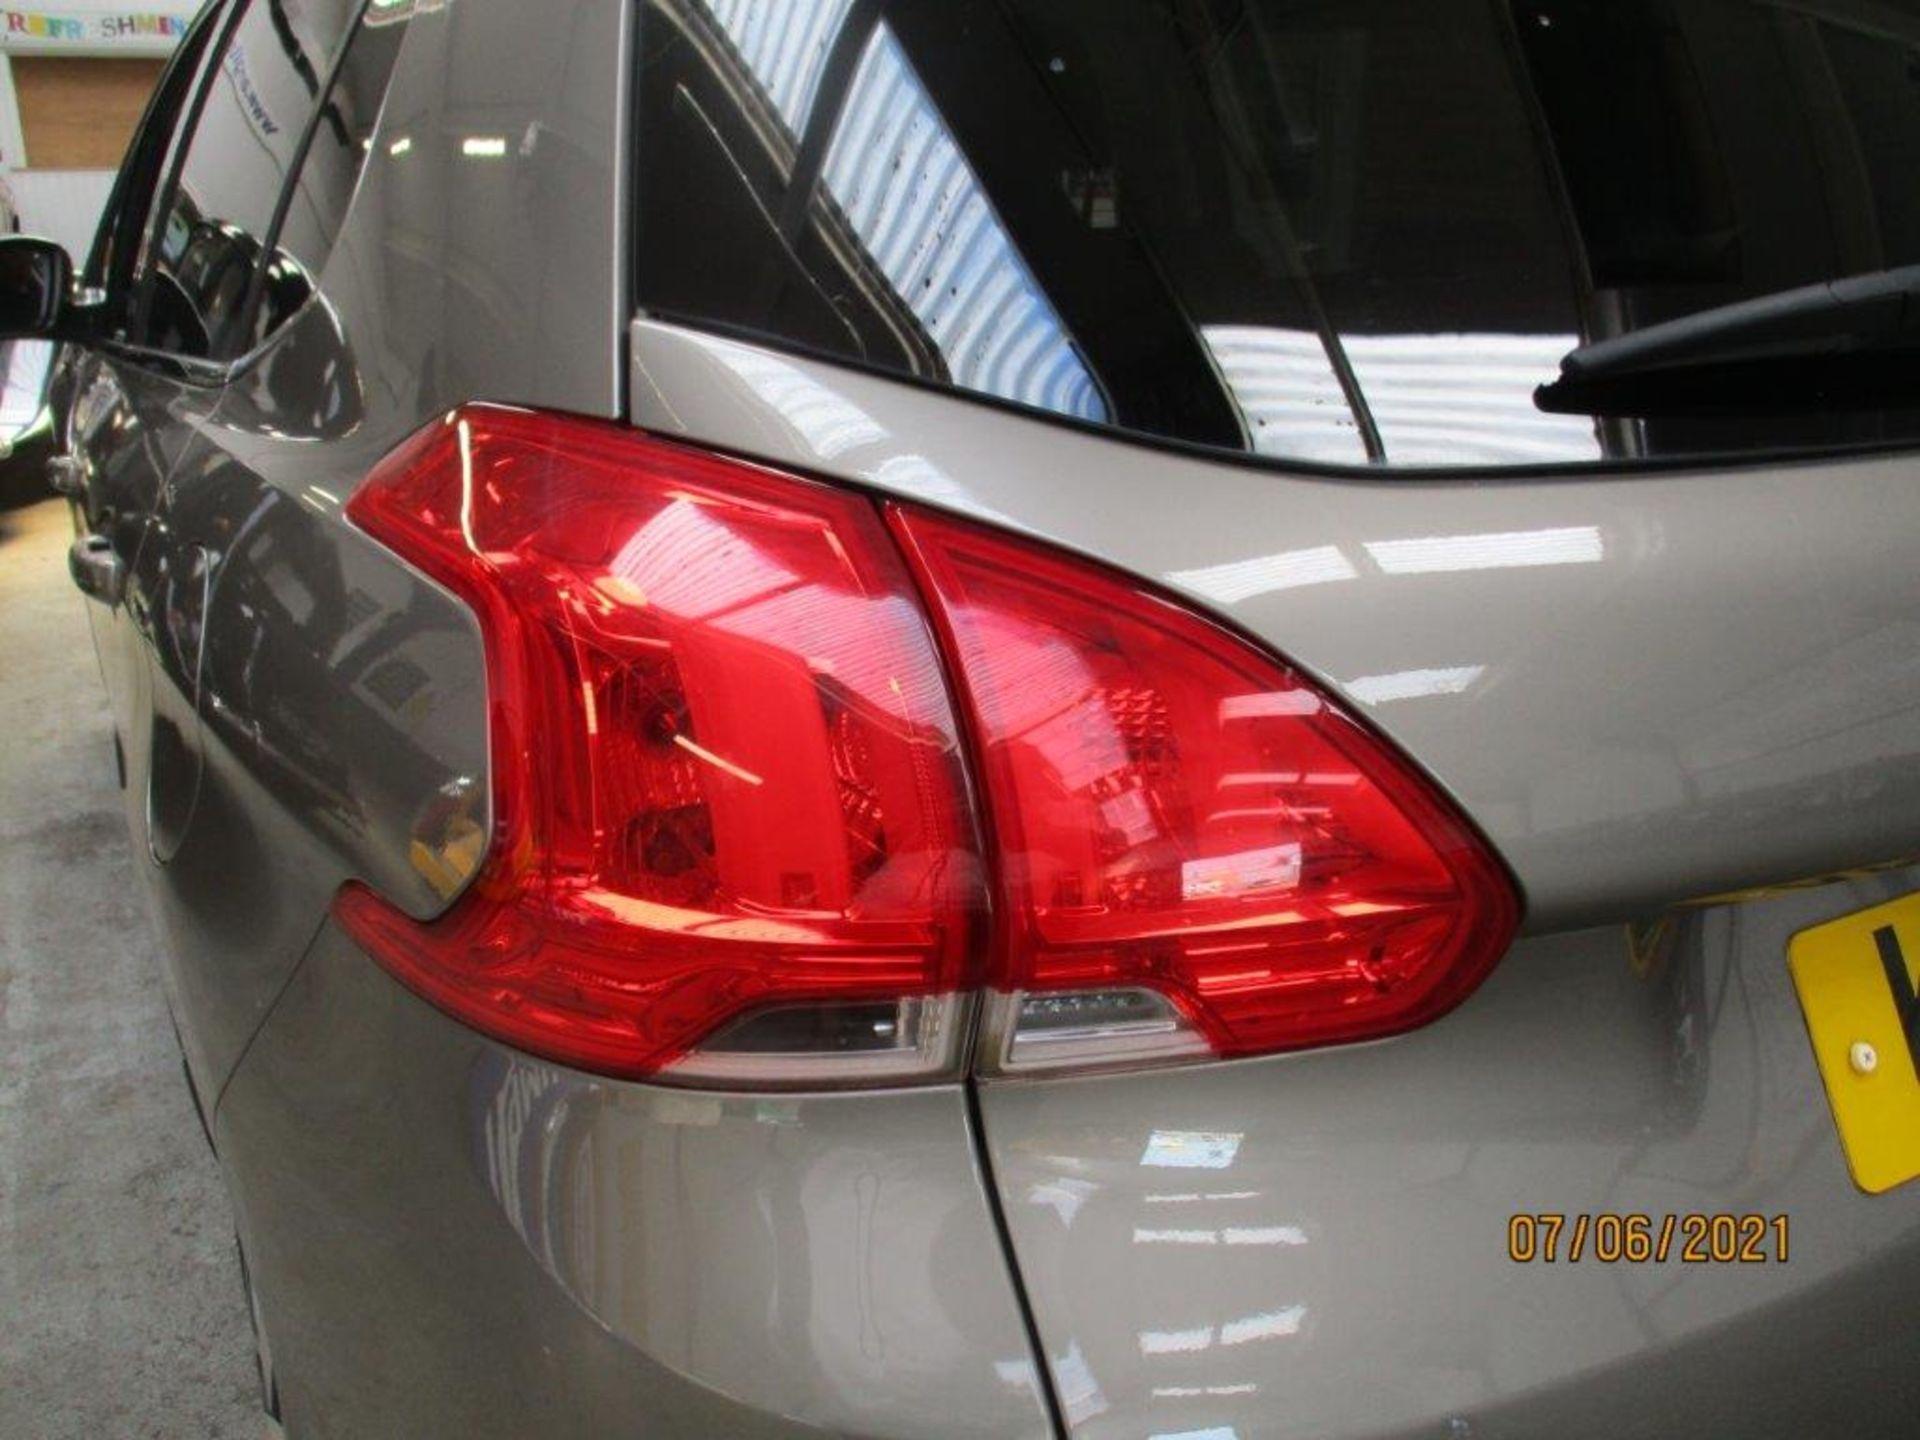 64 15 Peugeot 2008 Allure E-HDI - Image 4 of 25